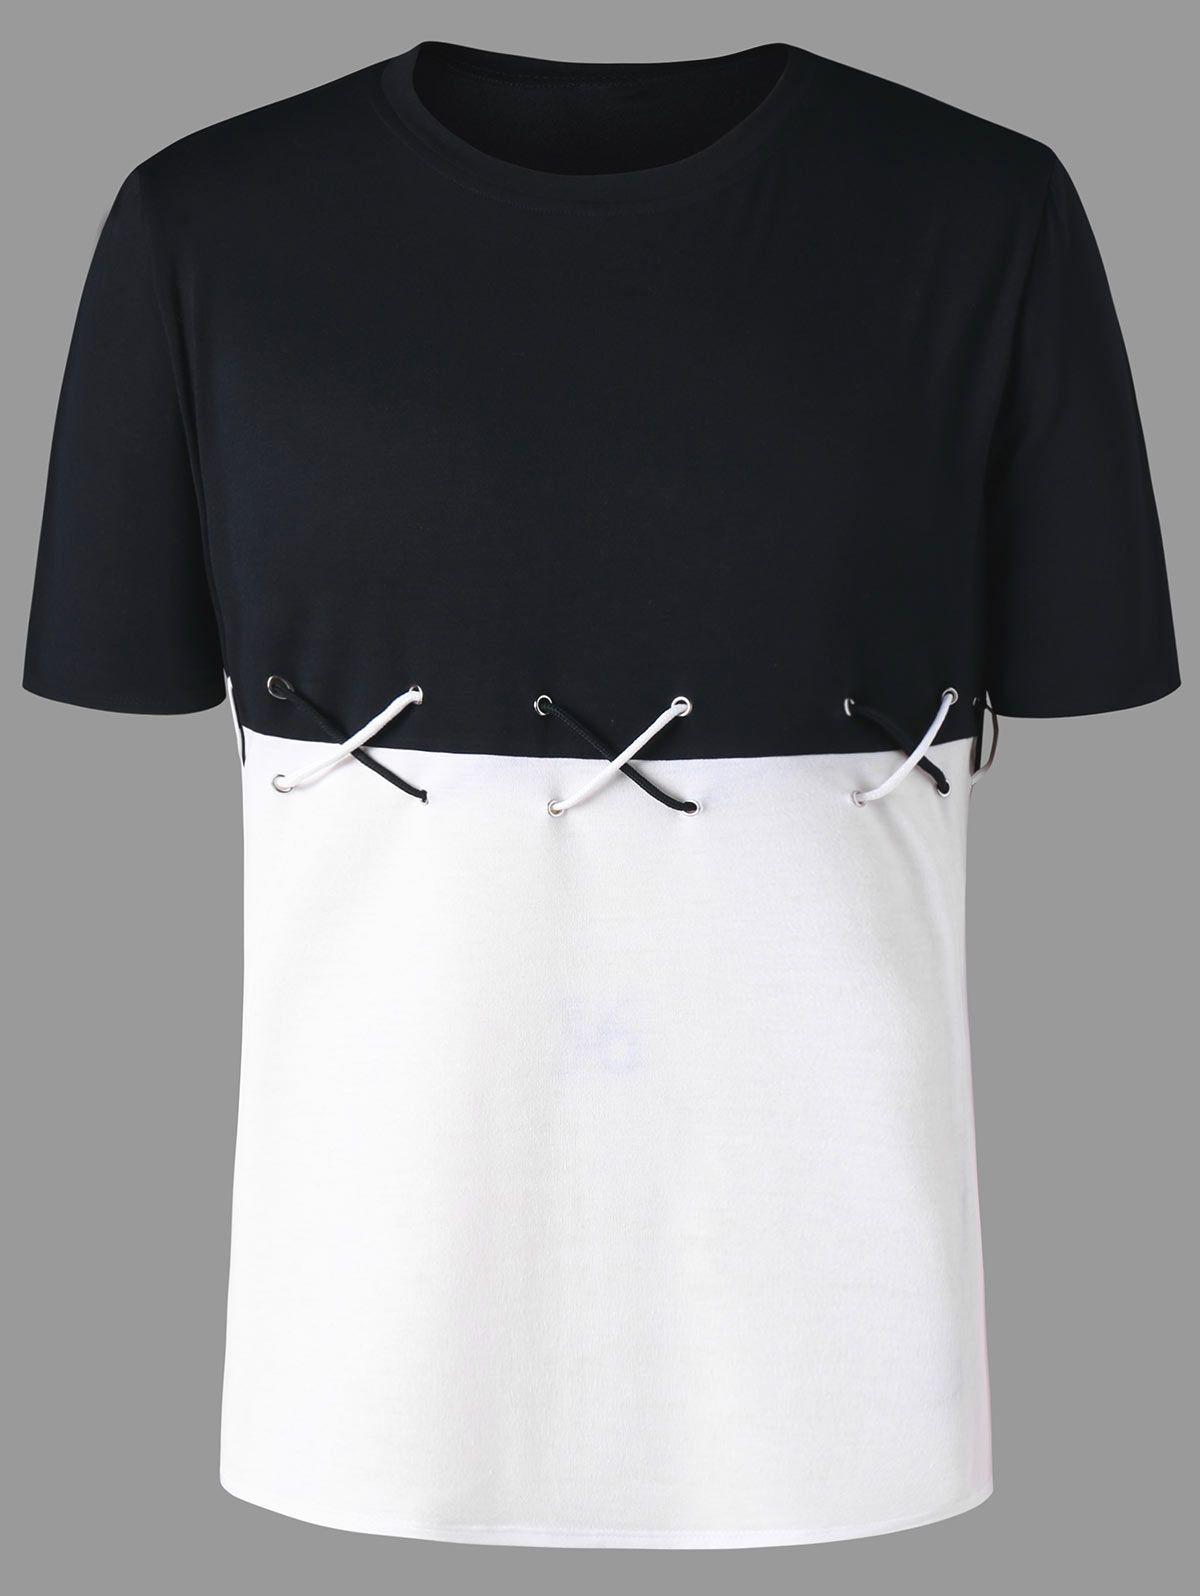 5ff91ac0bf81 2018 Summer New Fashion Color Block Lace Up T Shirt Crew Neck Short Sleeve  Tee Men S T Shirt Casual Tee Shirt Men Clothing M 2XL Funny Tshirts Long  Sleeve ...